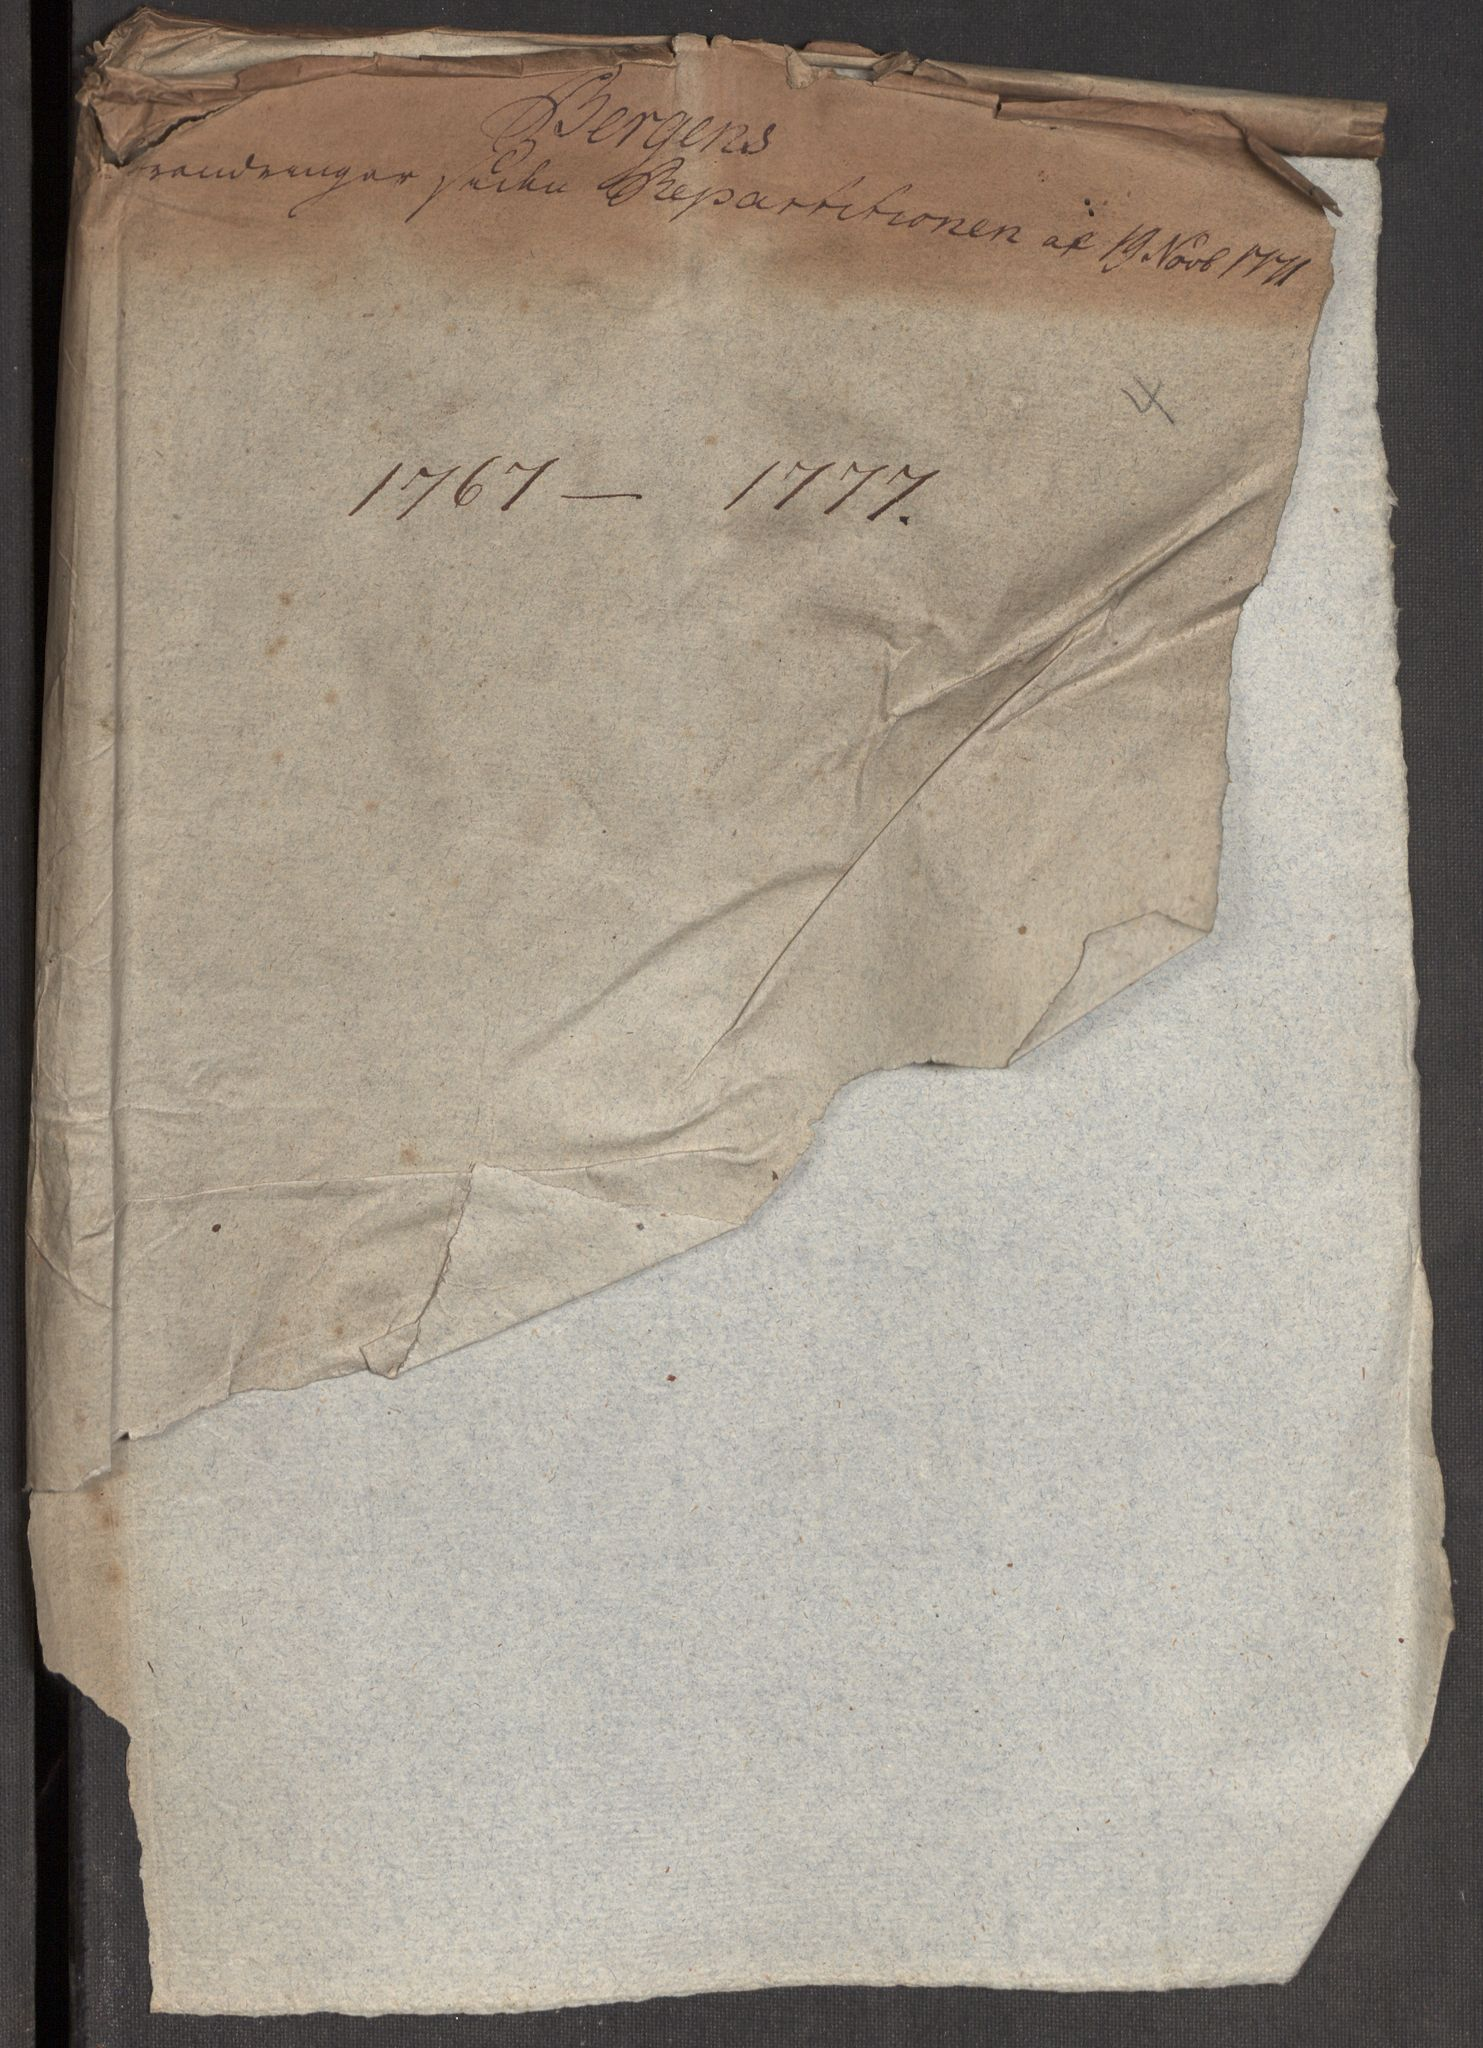 RA, Kommersekollegiet, Brannforsikringskontoret 1767-1814, F/Fa/L0004: Bergen, 1767-1777